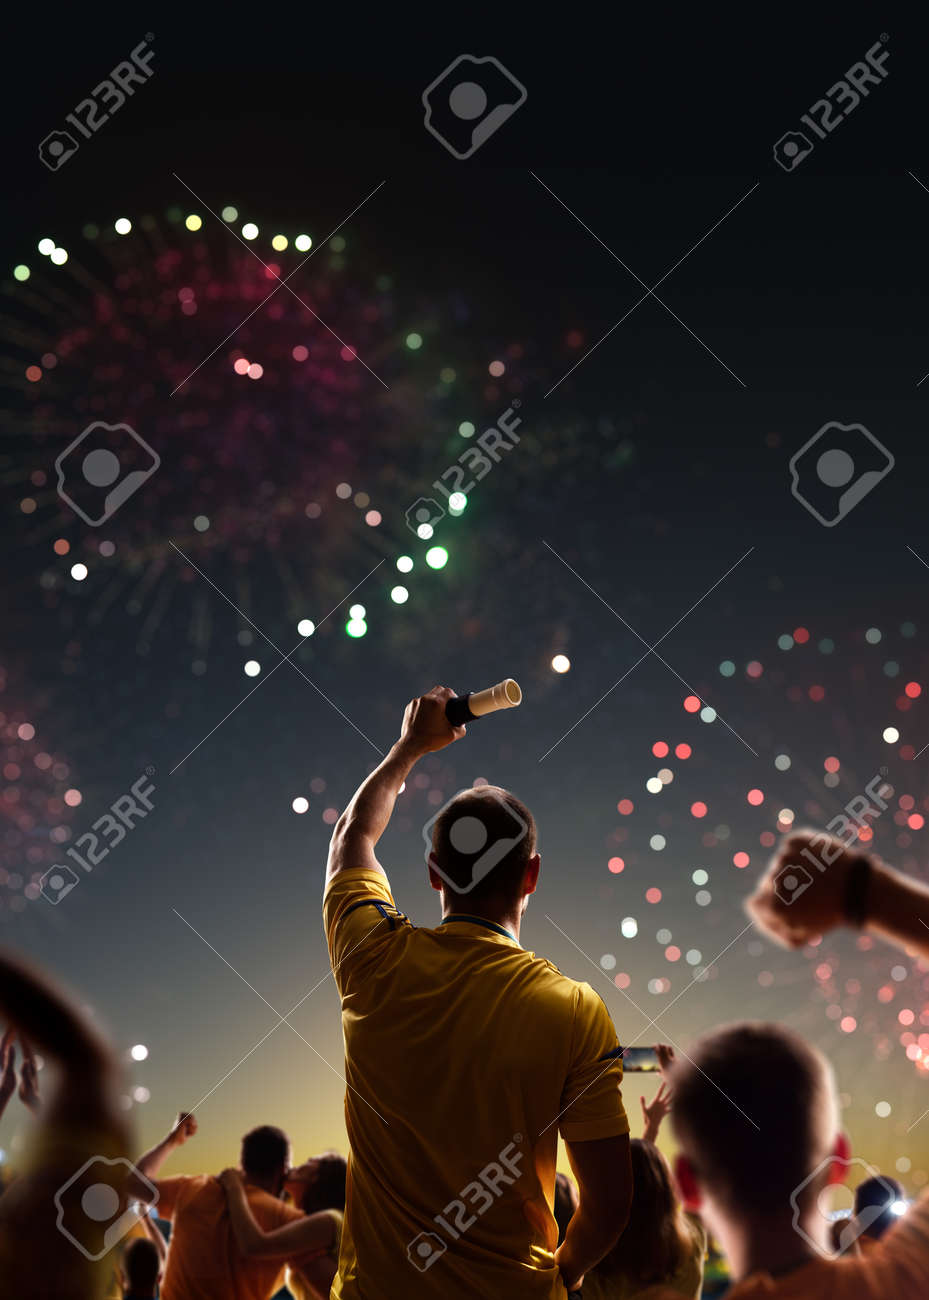 Fans celebrate in Stadium Arena night fireworks - 157292229